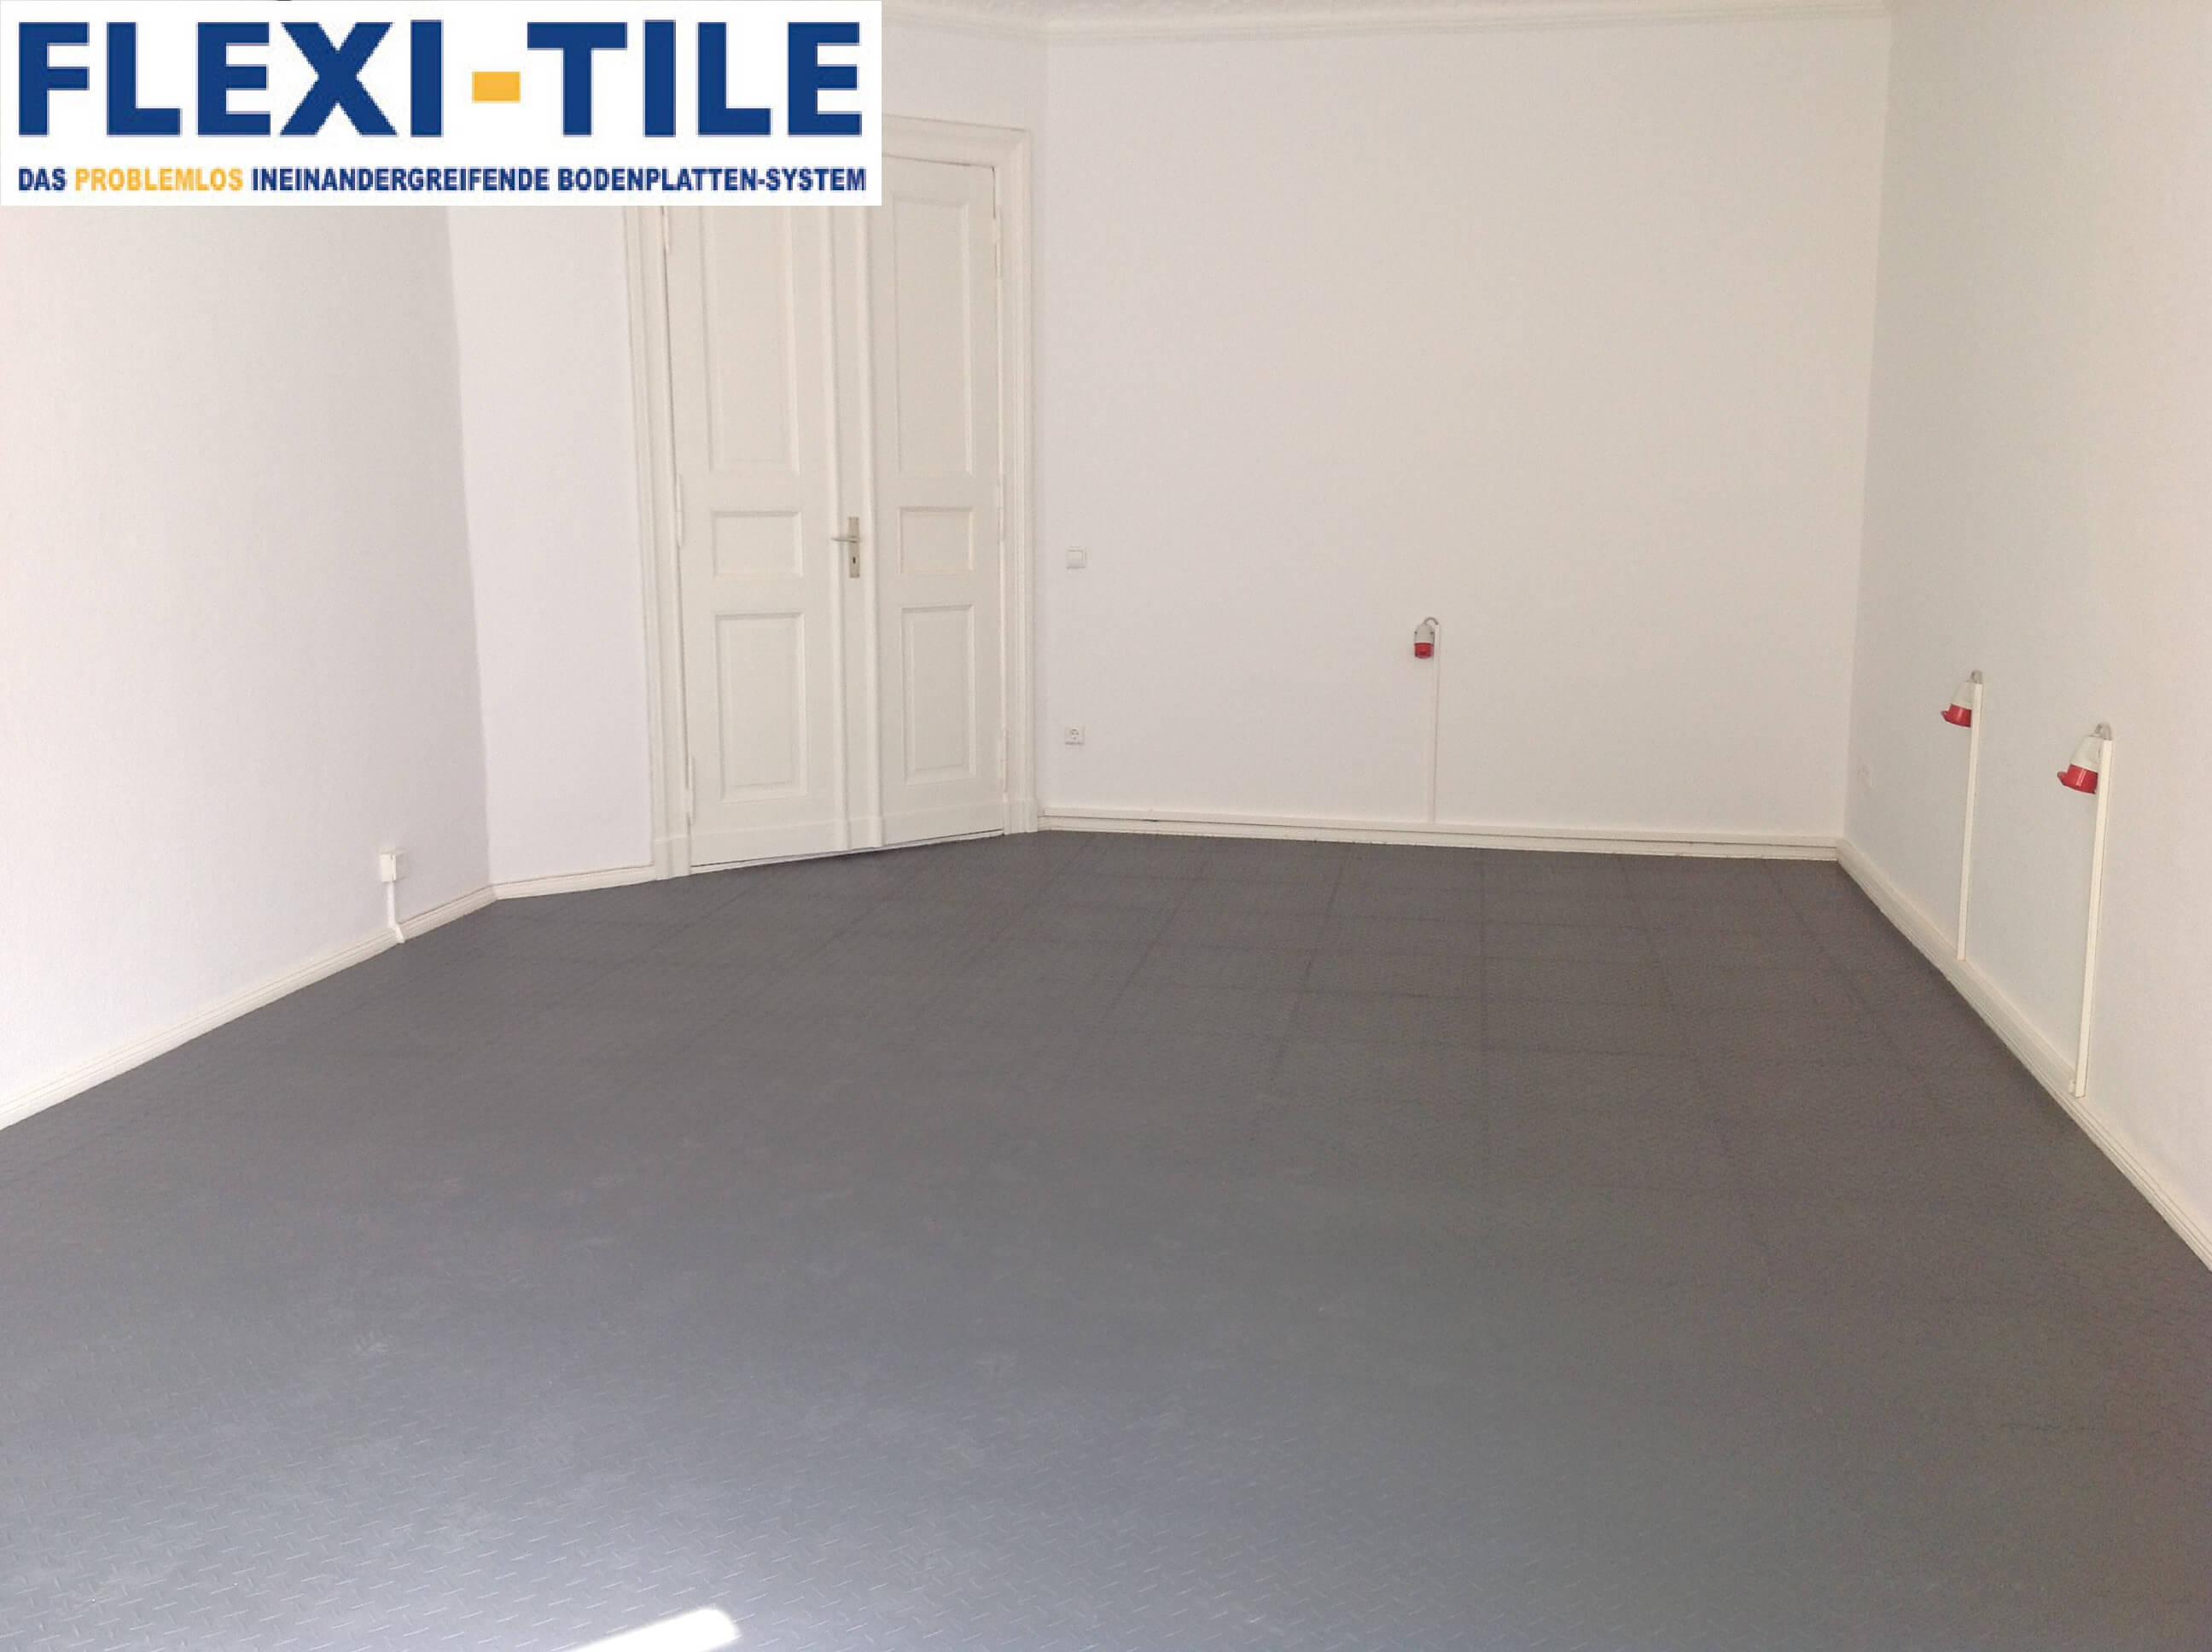 flexi tile pvc bodenfliesen als ladenboden anwendungsbeispiel riffel optik pvc fu bodenbelag. Black Bedroom Furniture Sets. Home Design Ideas